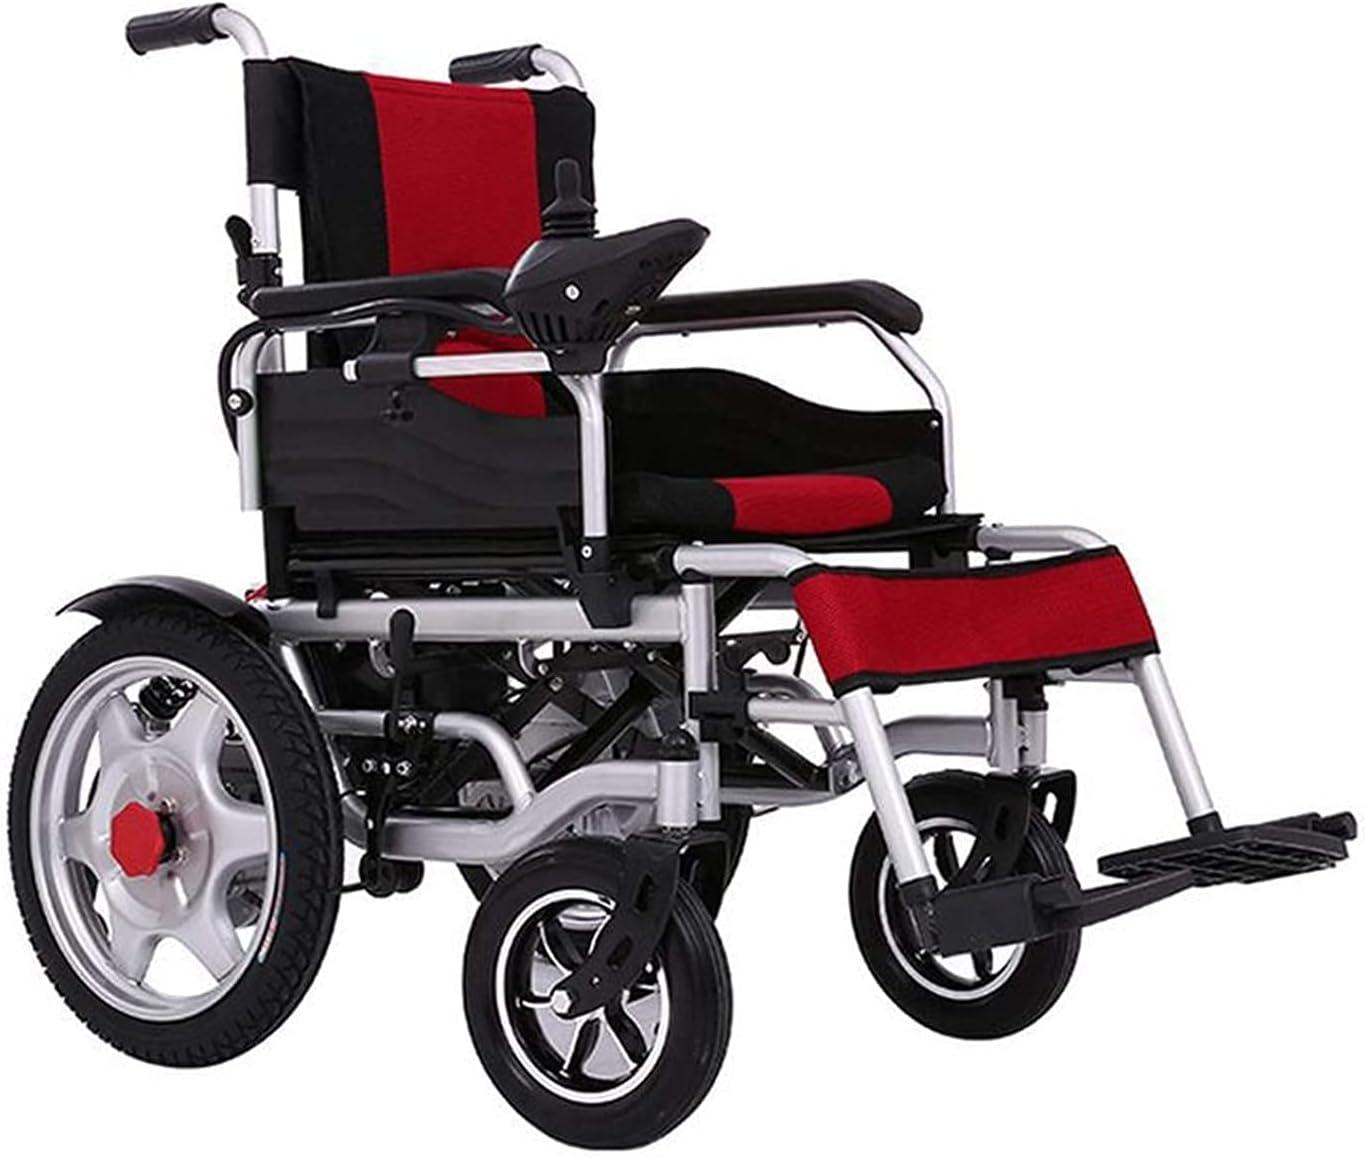 Electric Classic Wheelchair Pneumatic Tire Folding Rear New arrival Wheel Anti-Roll